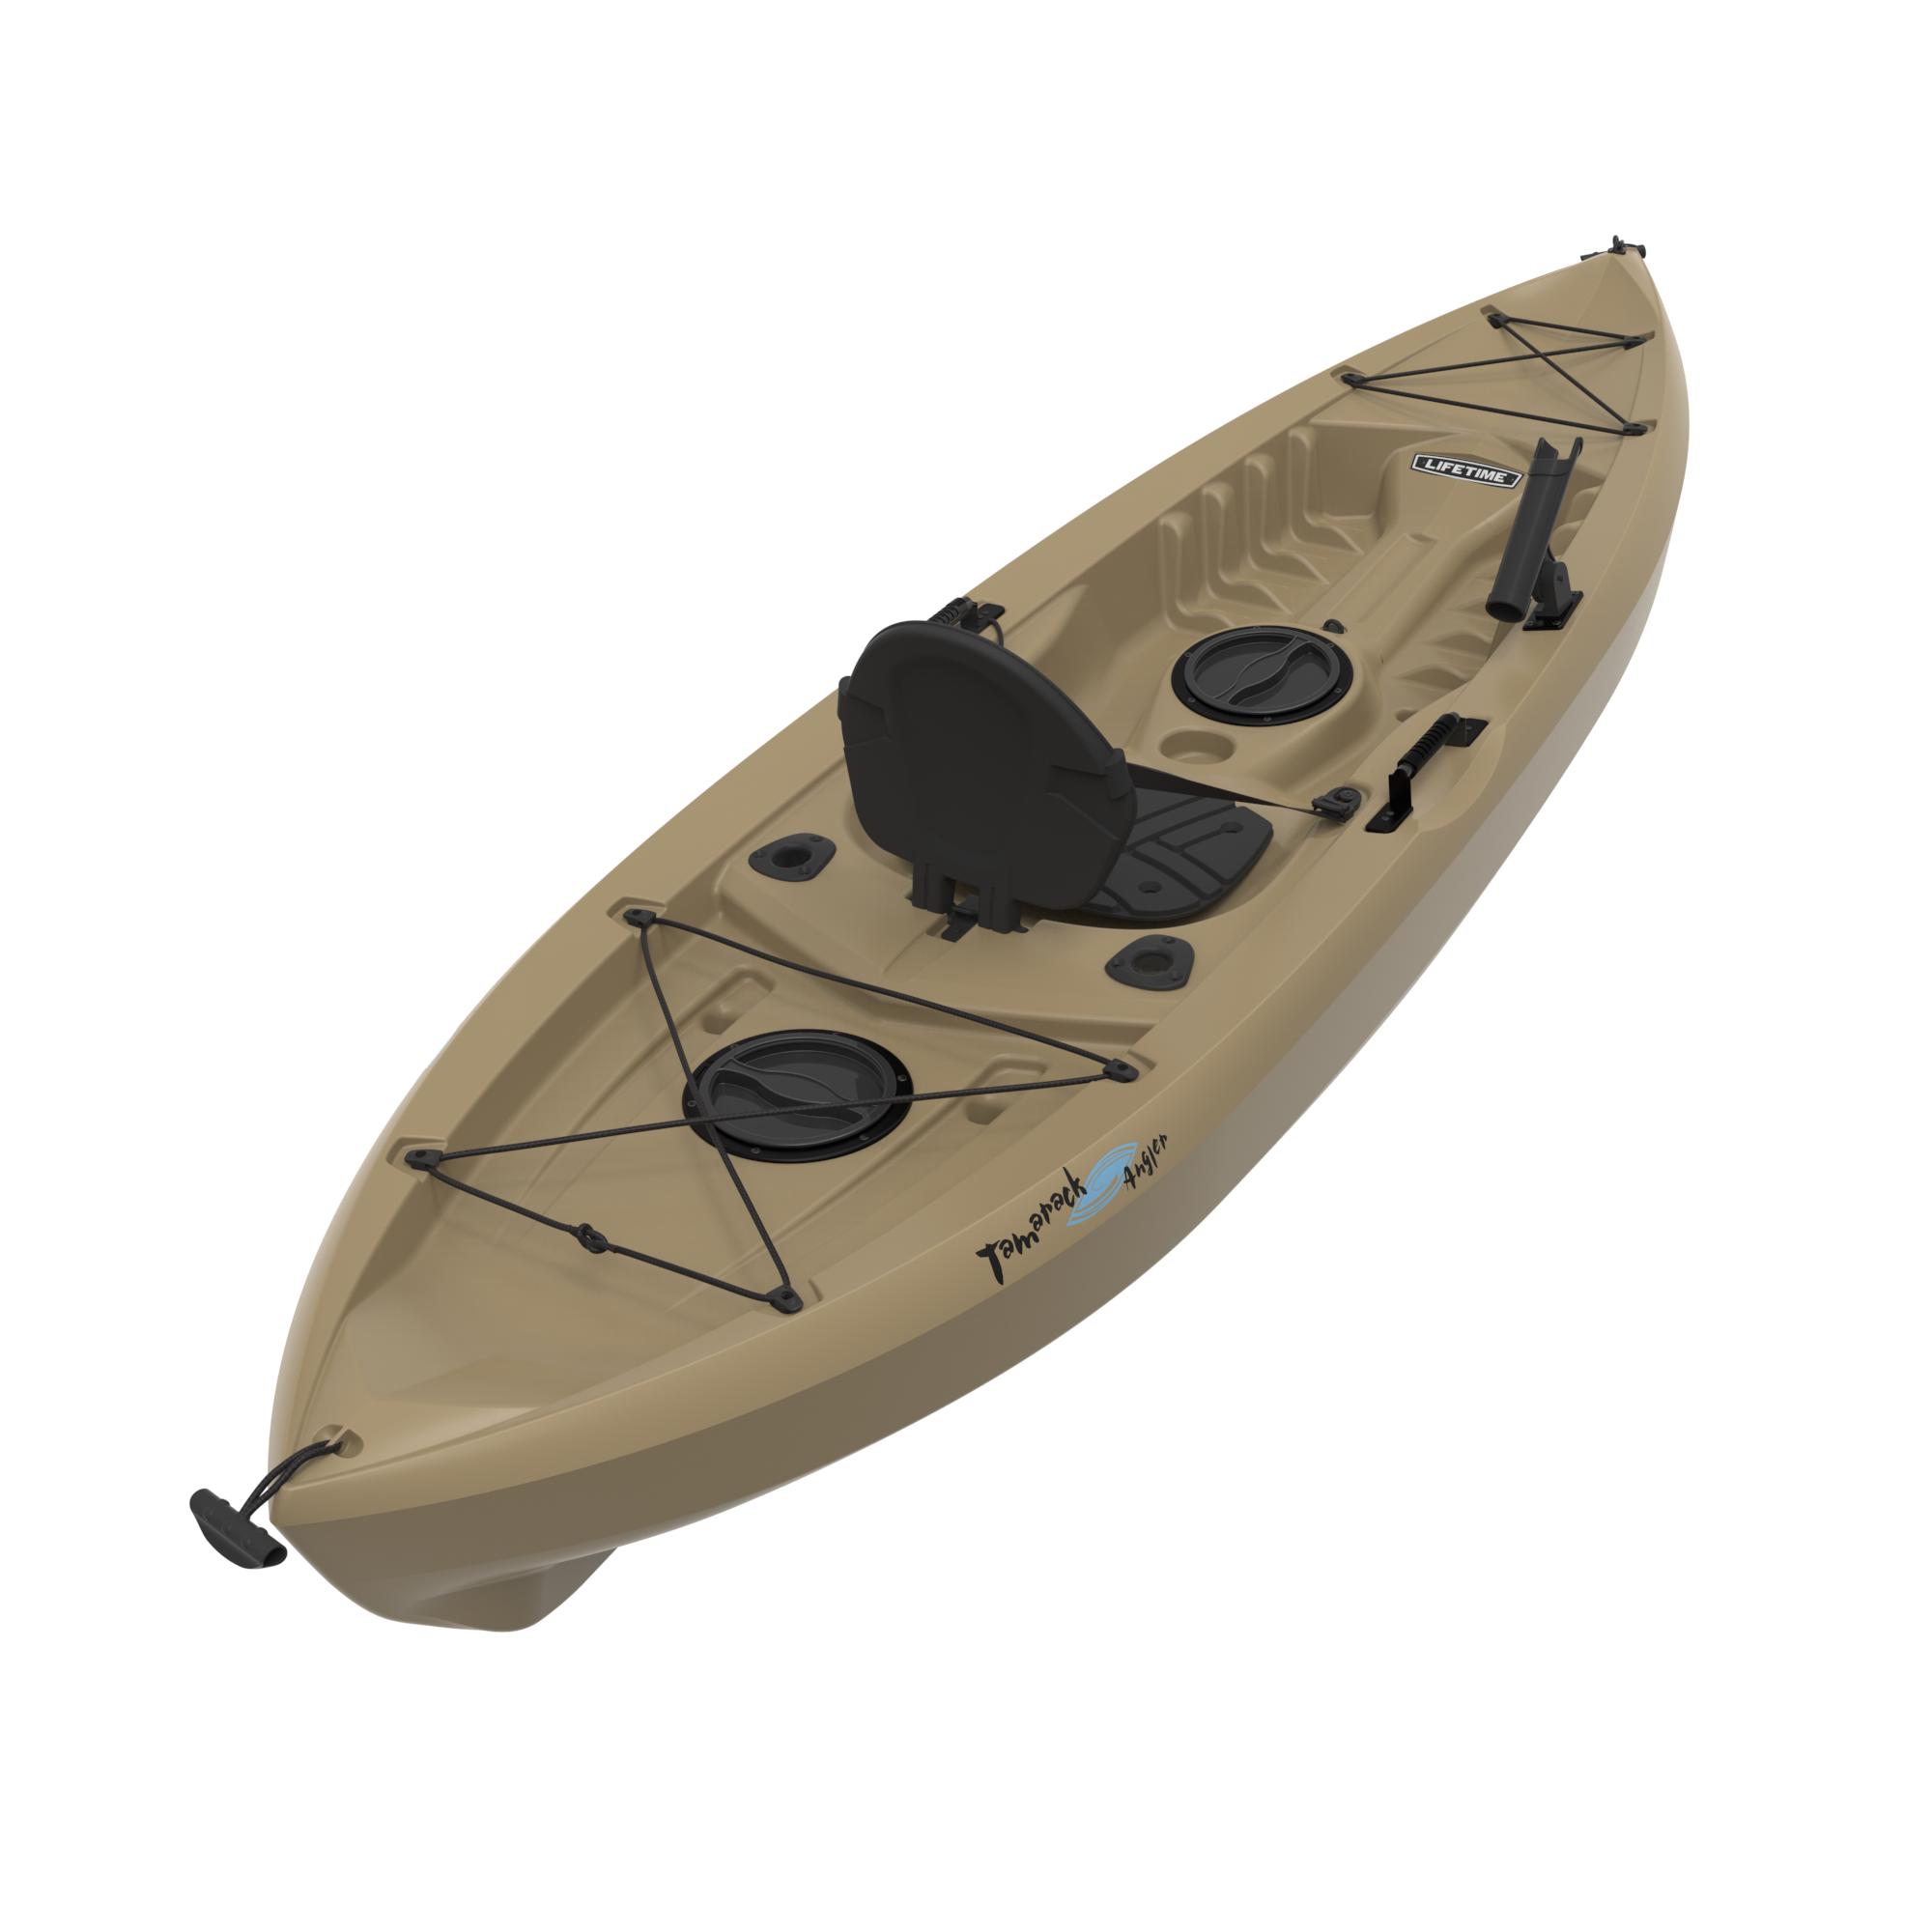 2 Pack Lifetime Muskie Angler Kayak On Sale Free